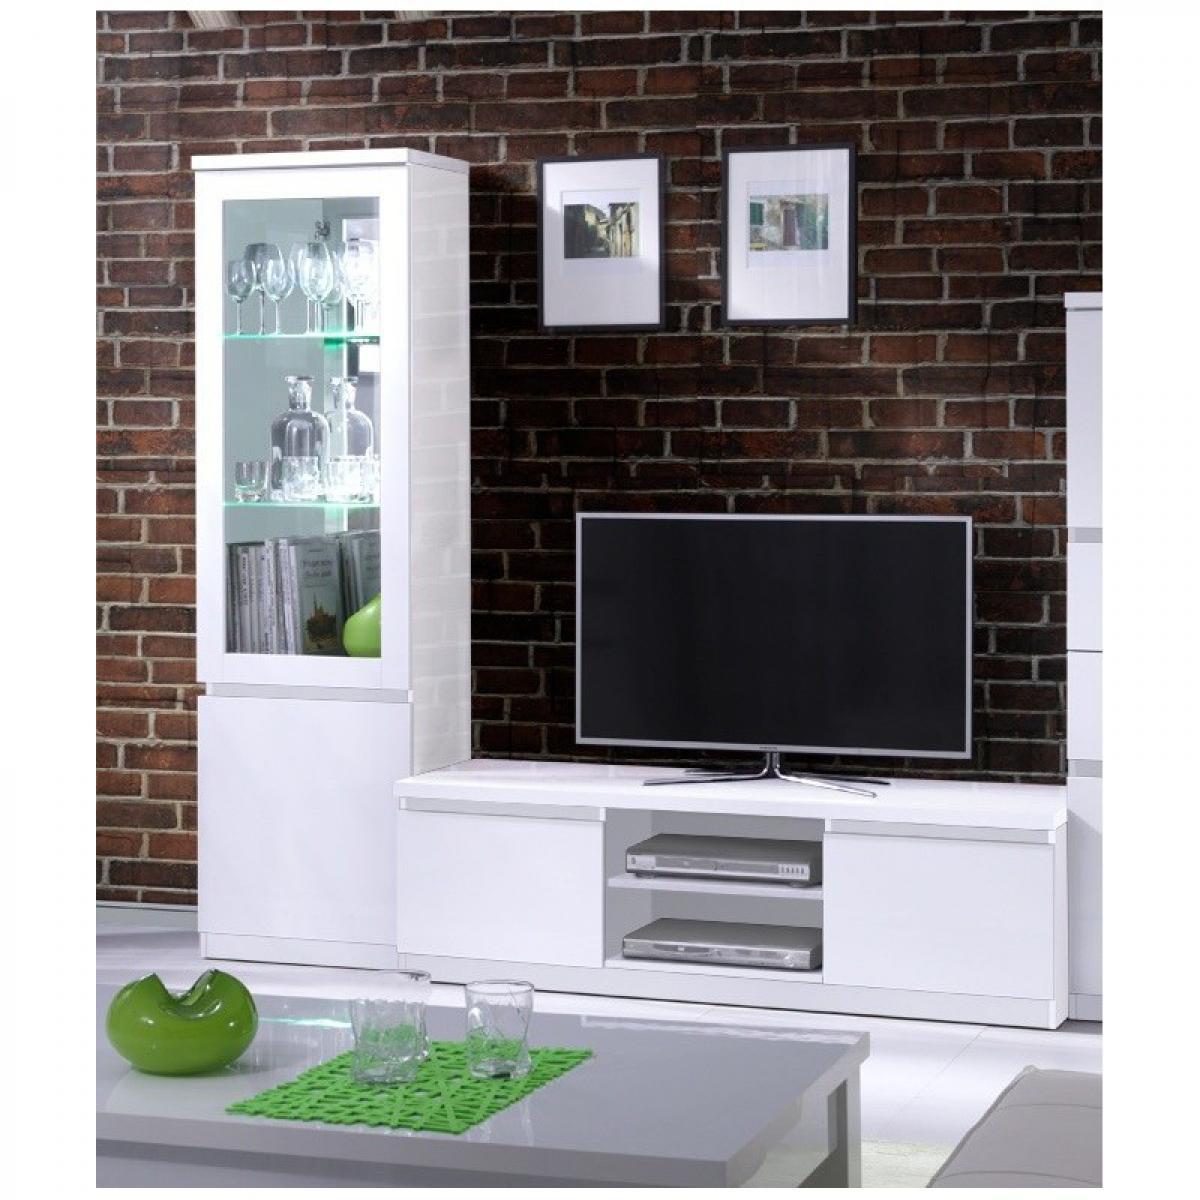 meublorama Ensemble pour votre salon FABIO. Meuble tv hifi + vitrine petit modèle + LED. Meubles design haute brillance